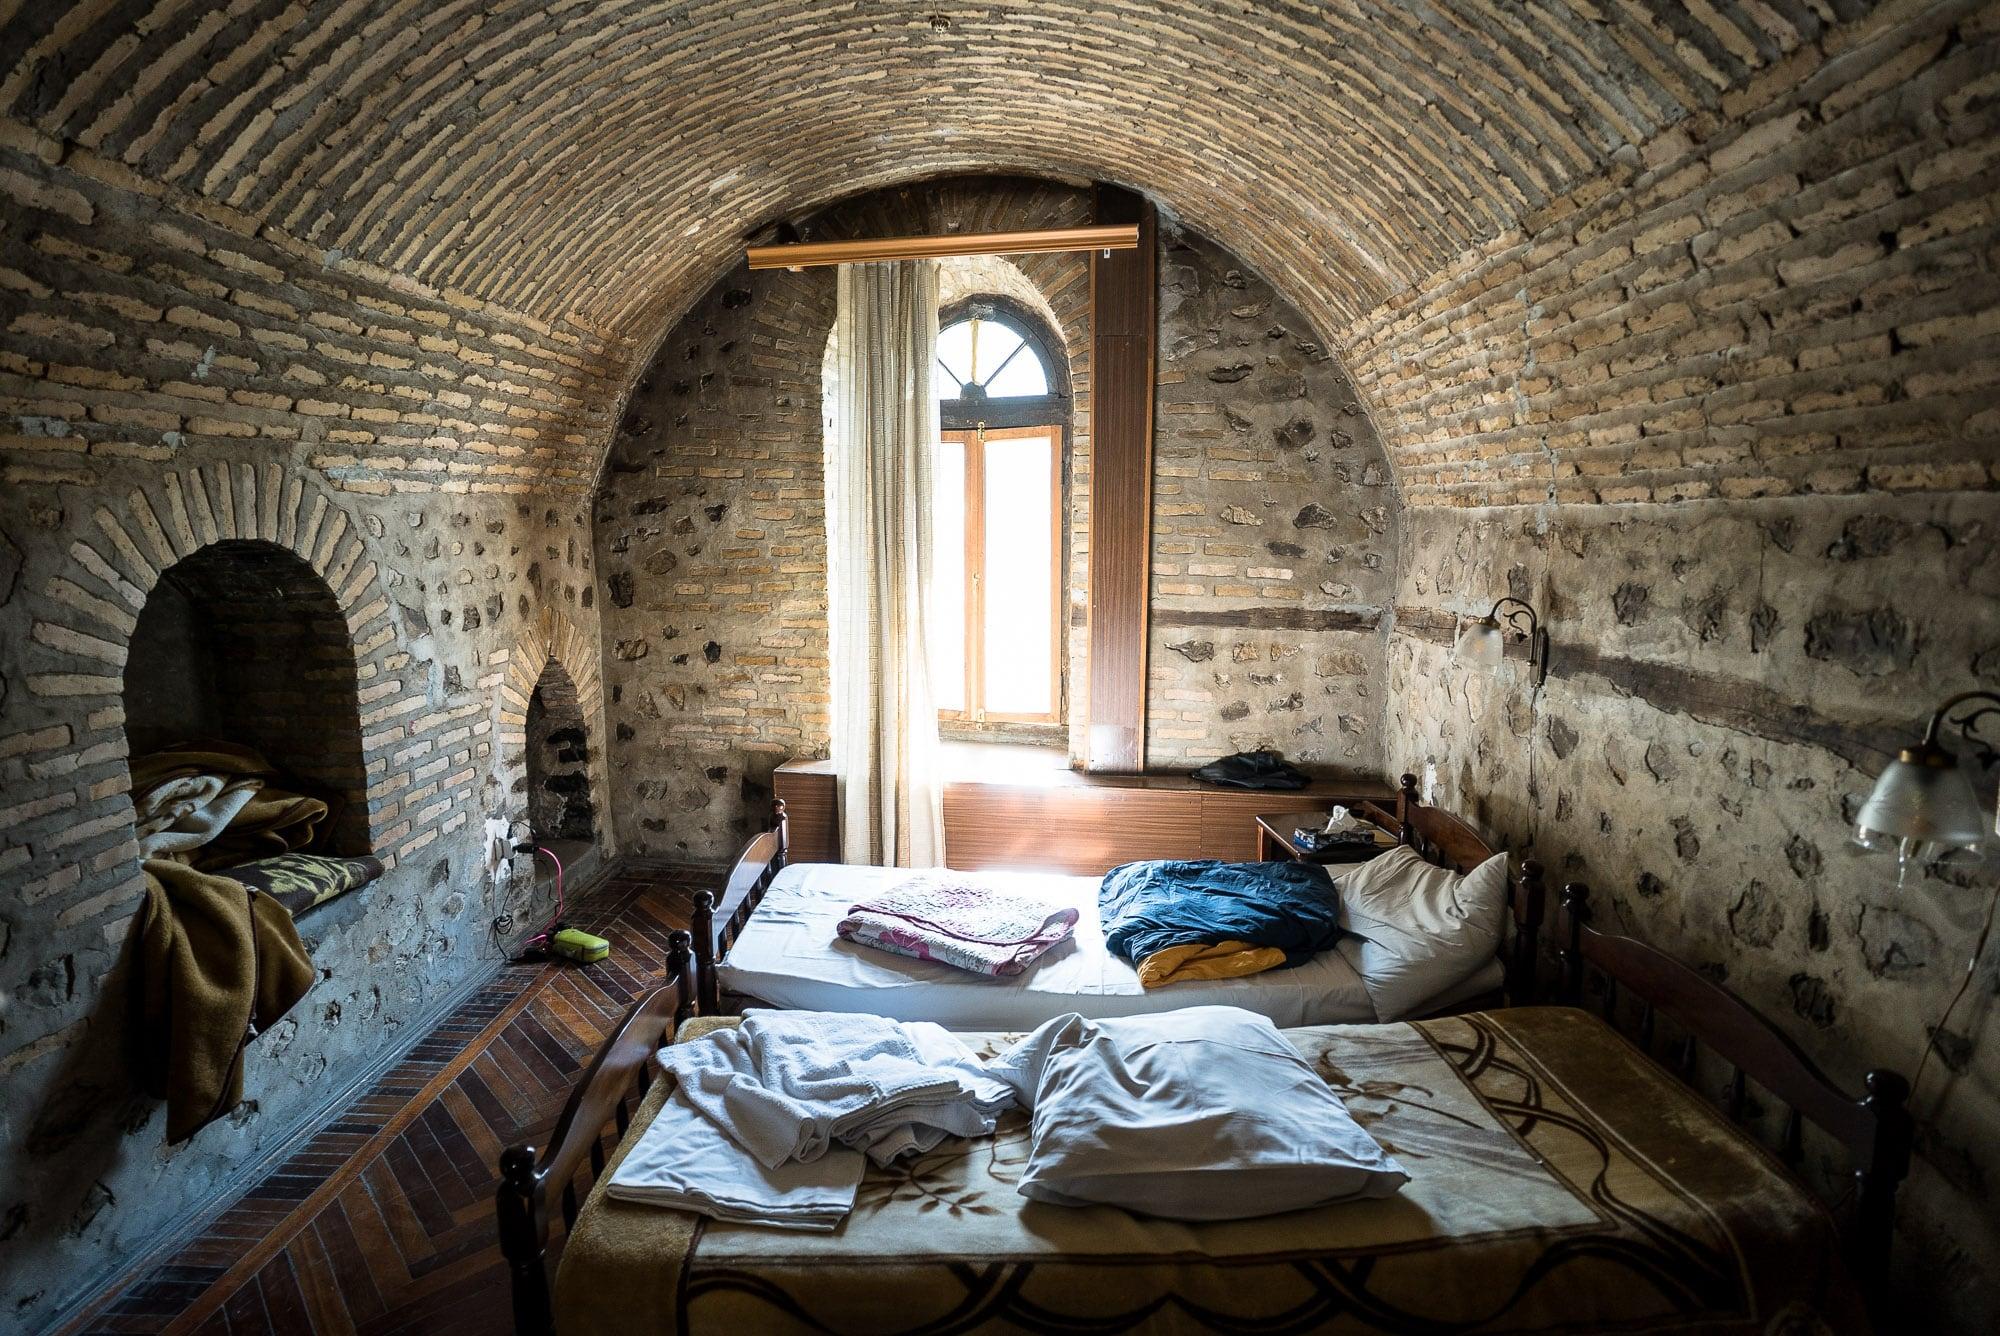 bed in the Caravanserai